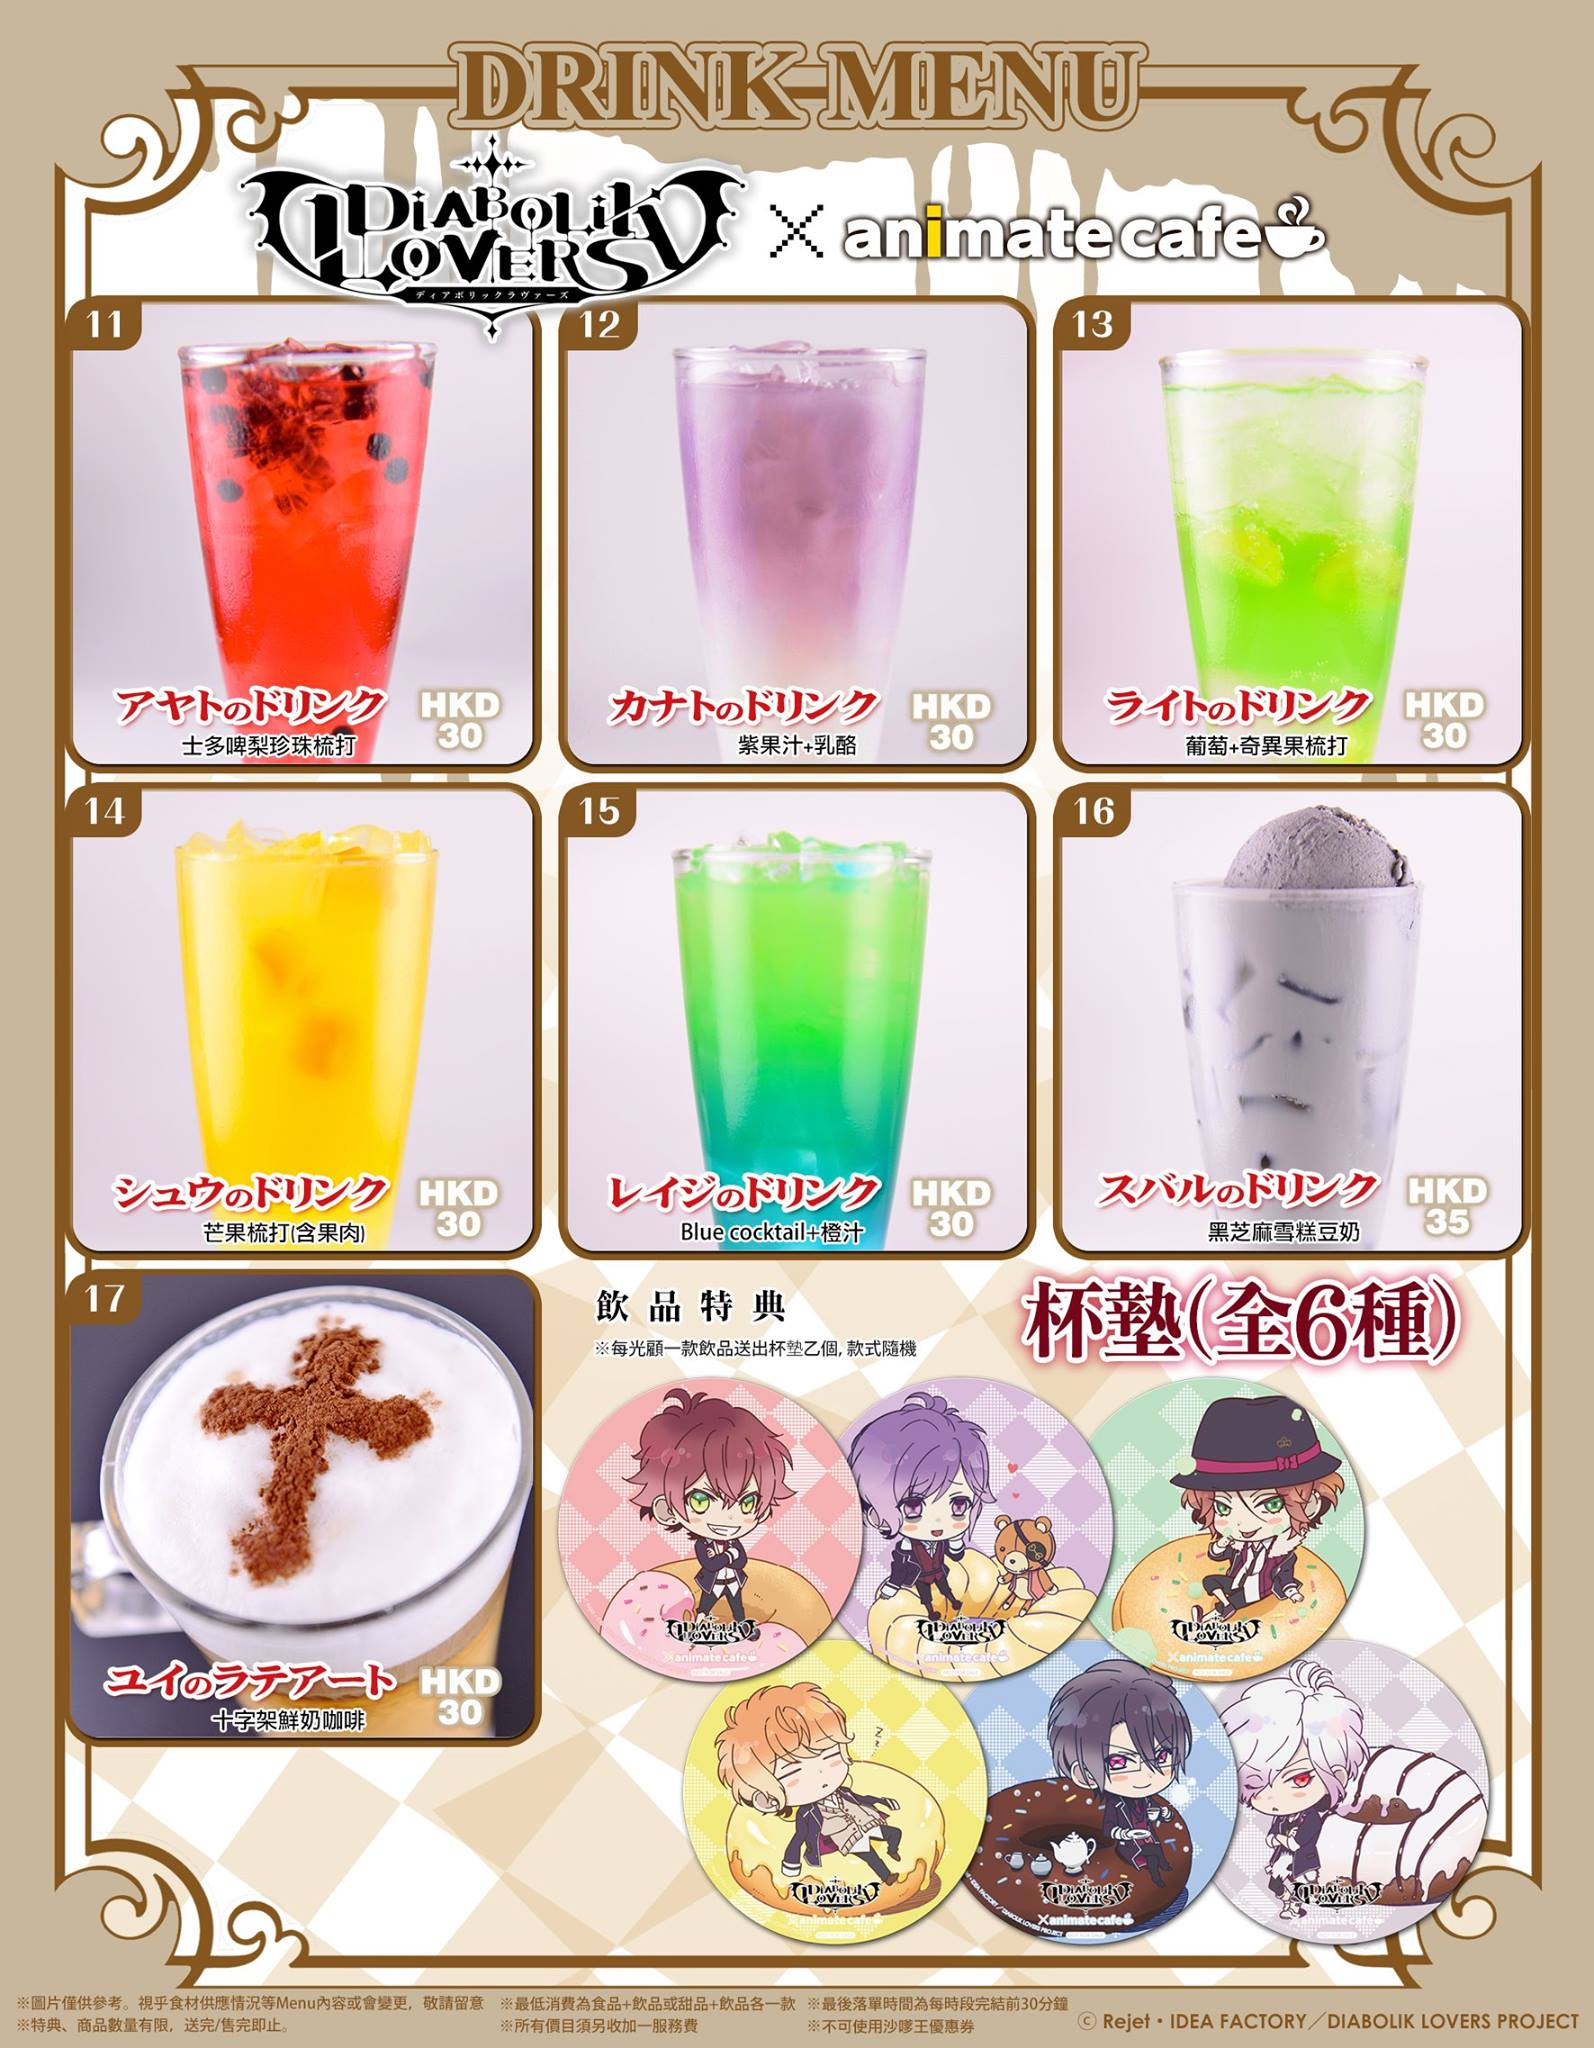 DIABOLIK LOVERS × animate cafe 香港店 9 月 1 日開幕